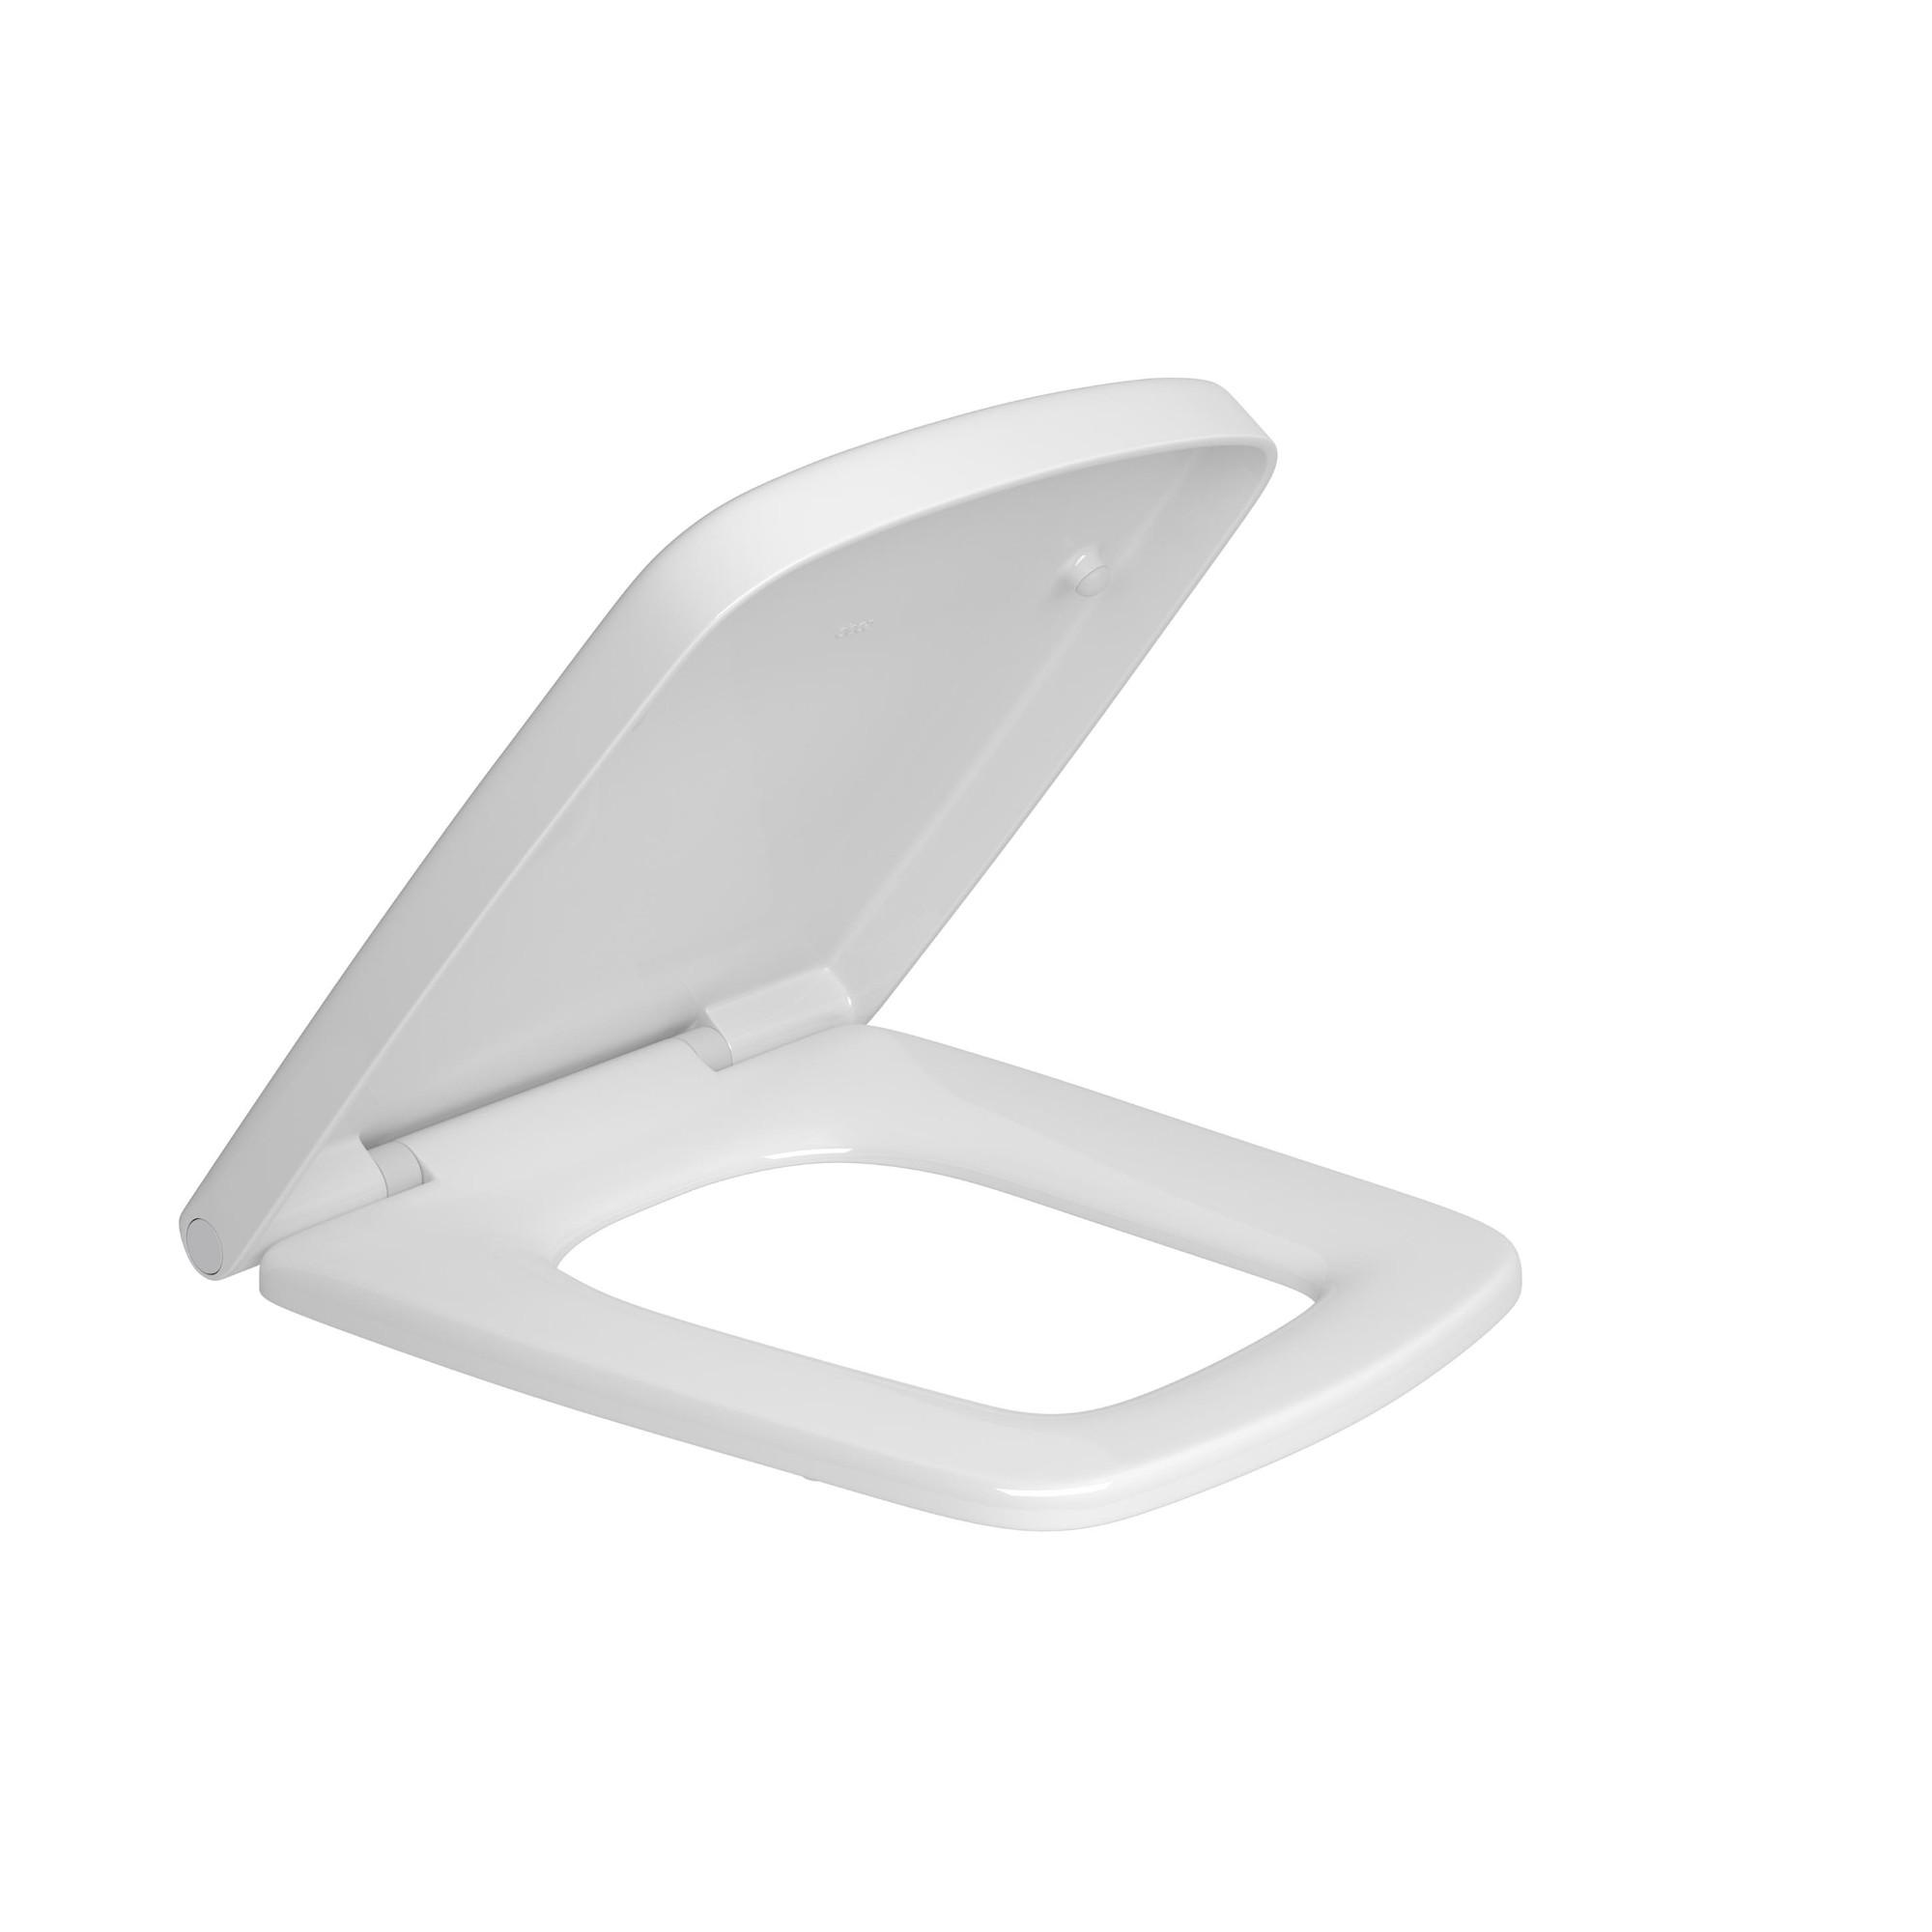 Assento Sanitario Quadrado Clean Termo AP46617 Branco Gelo - Deca